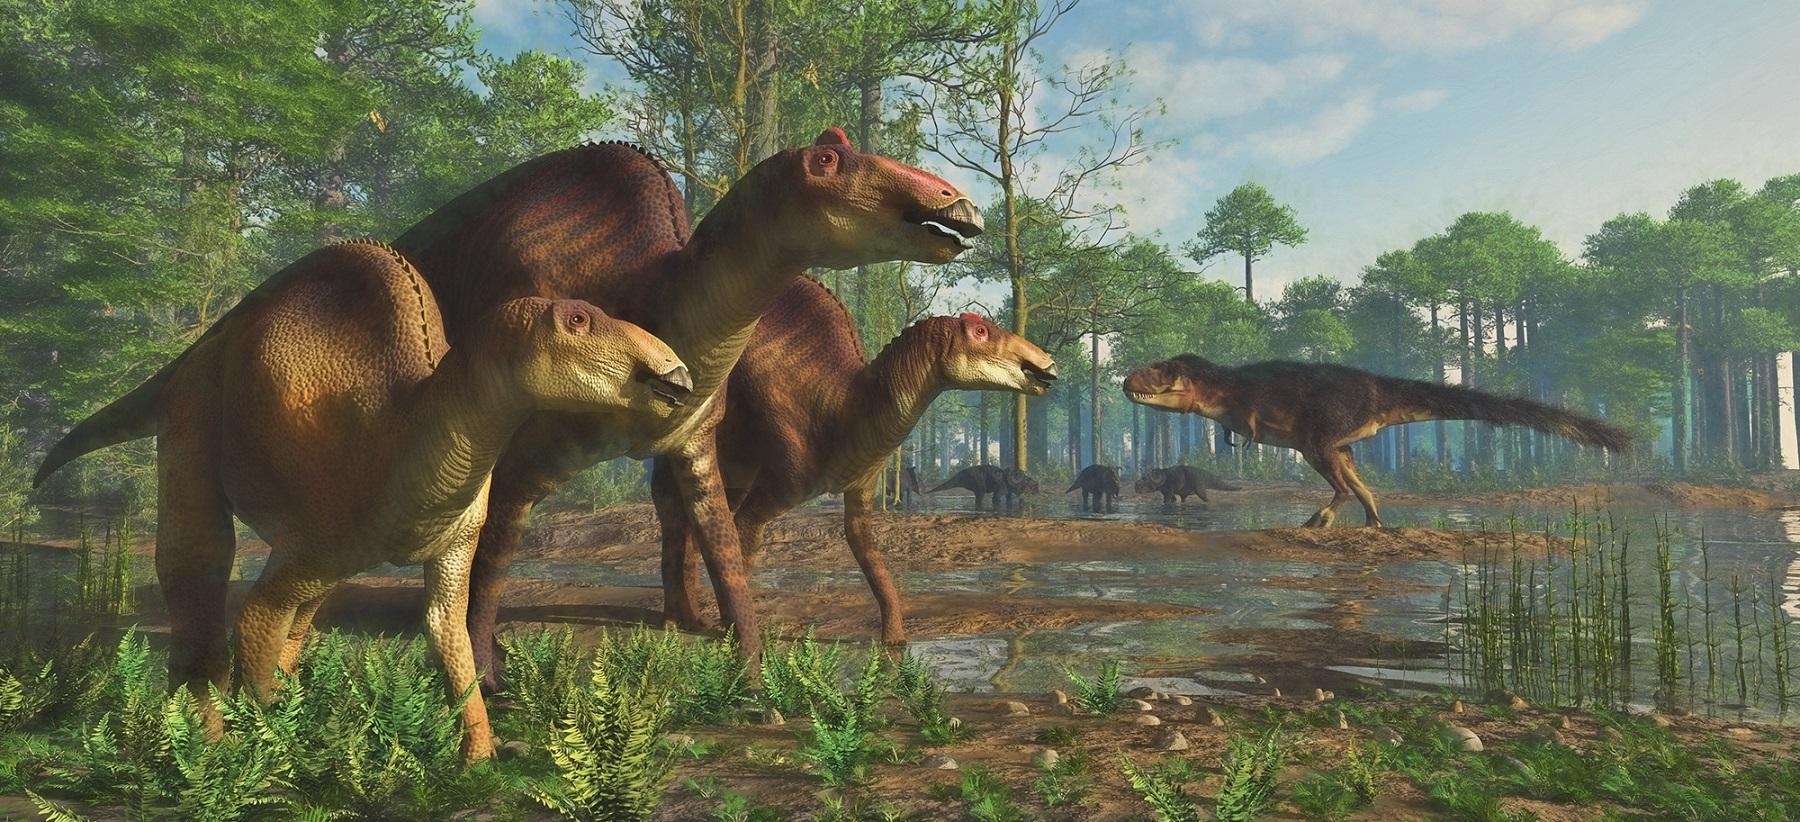 Edmontosaurus Regalis Herd